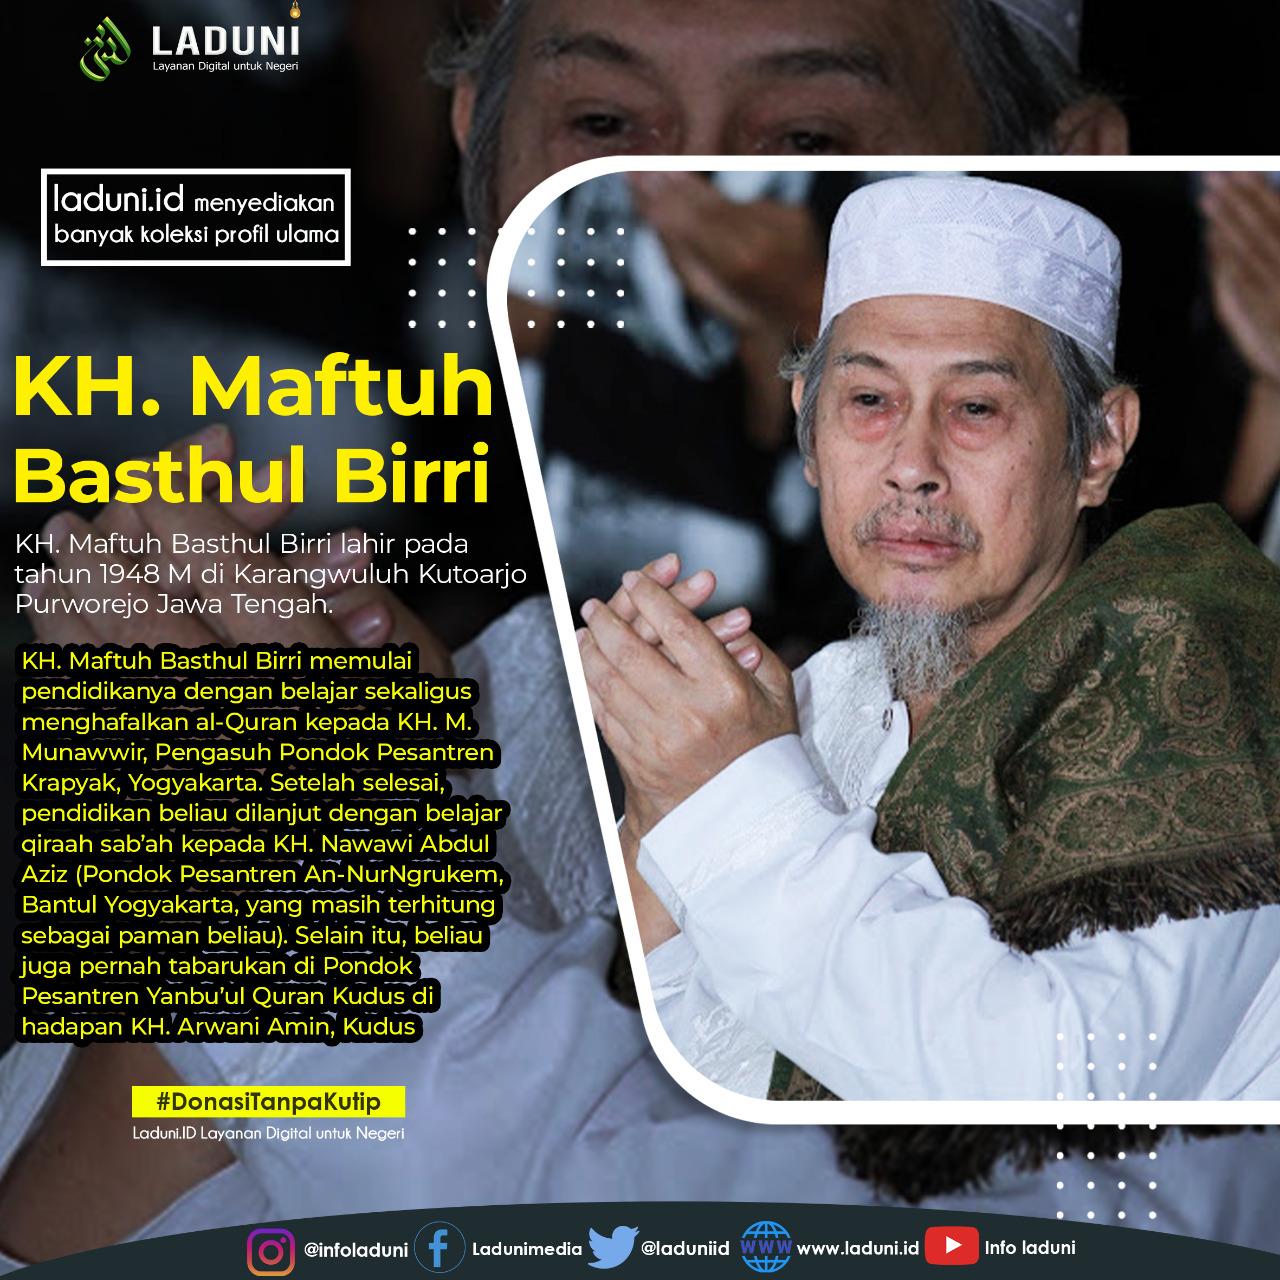 Biografi KH. Maftuh Said